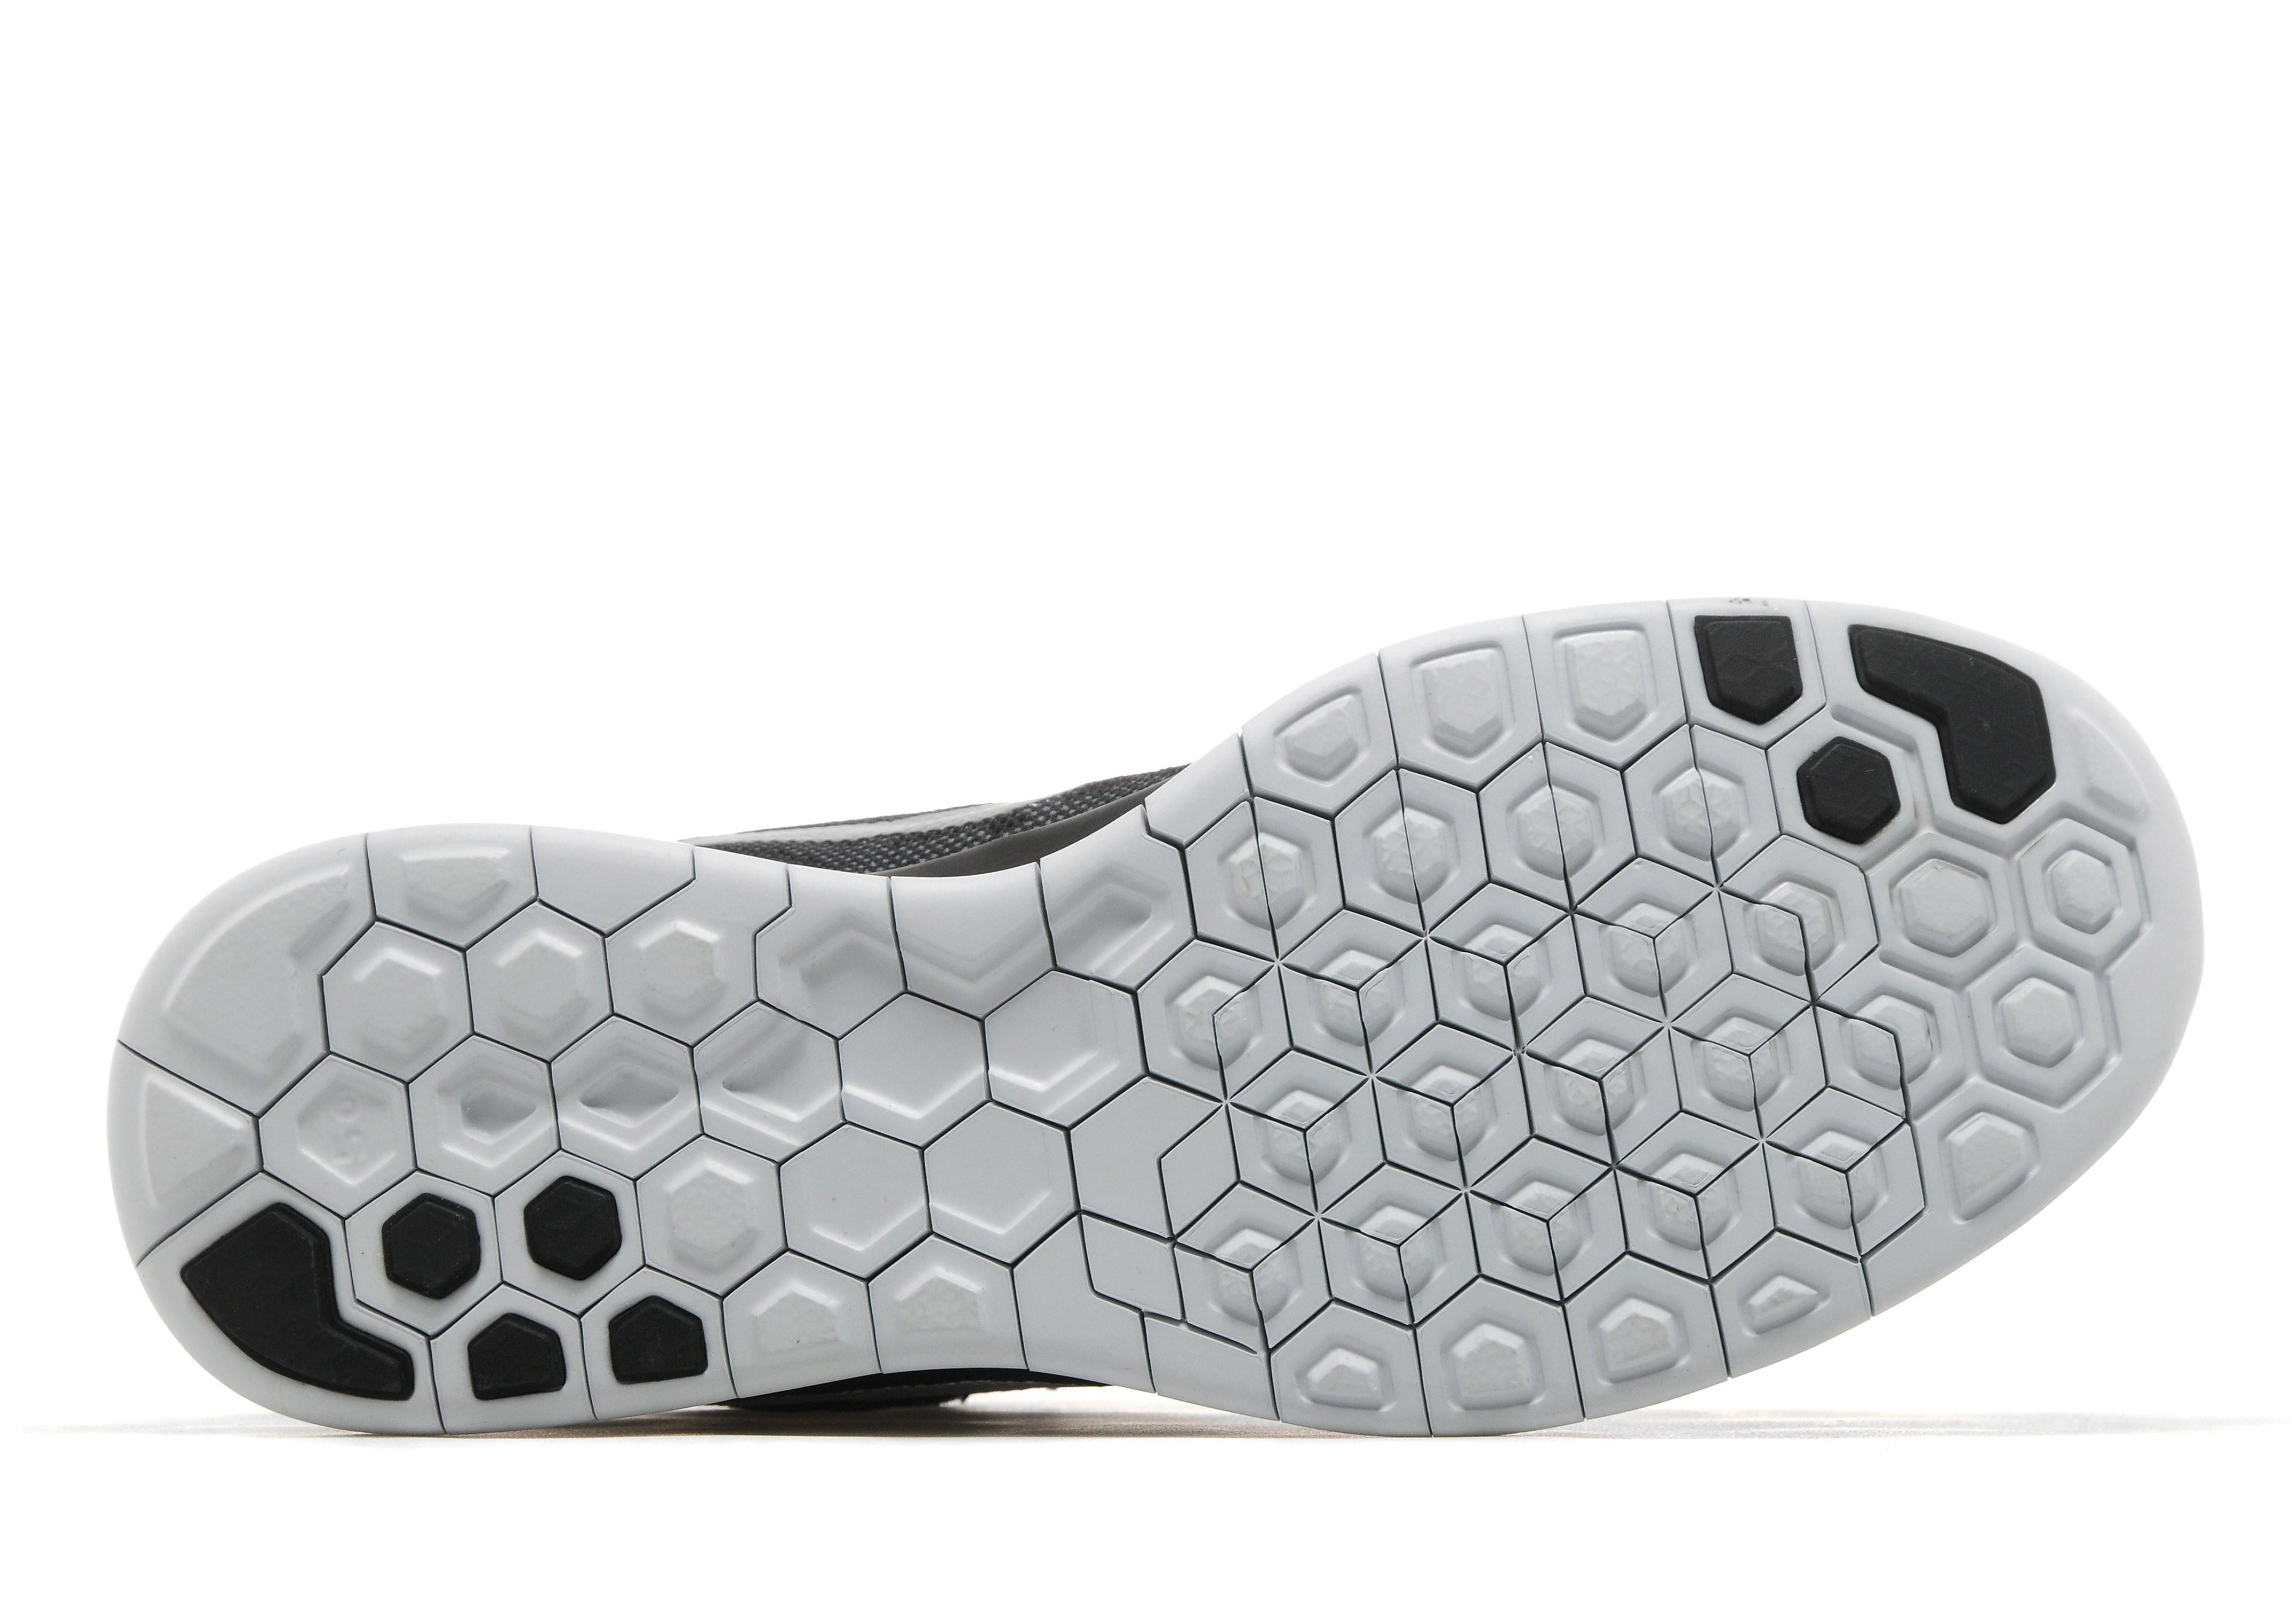 Nike Free 5.0 Flash